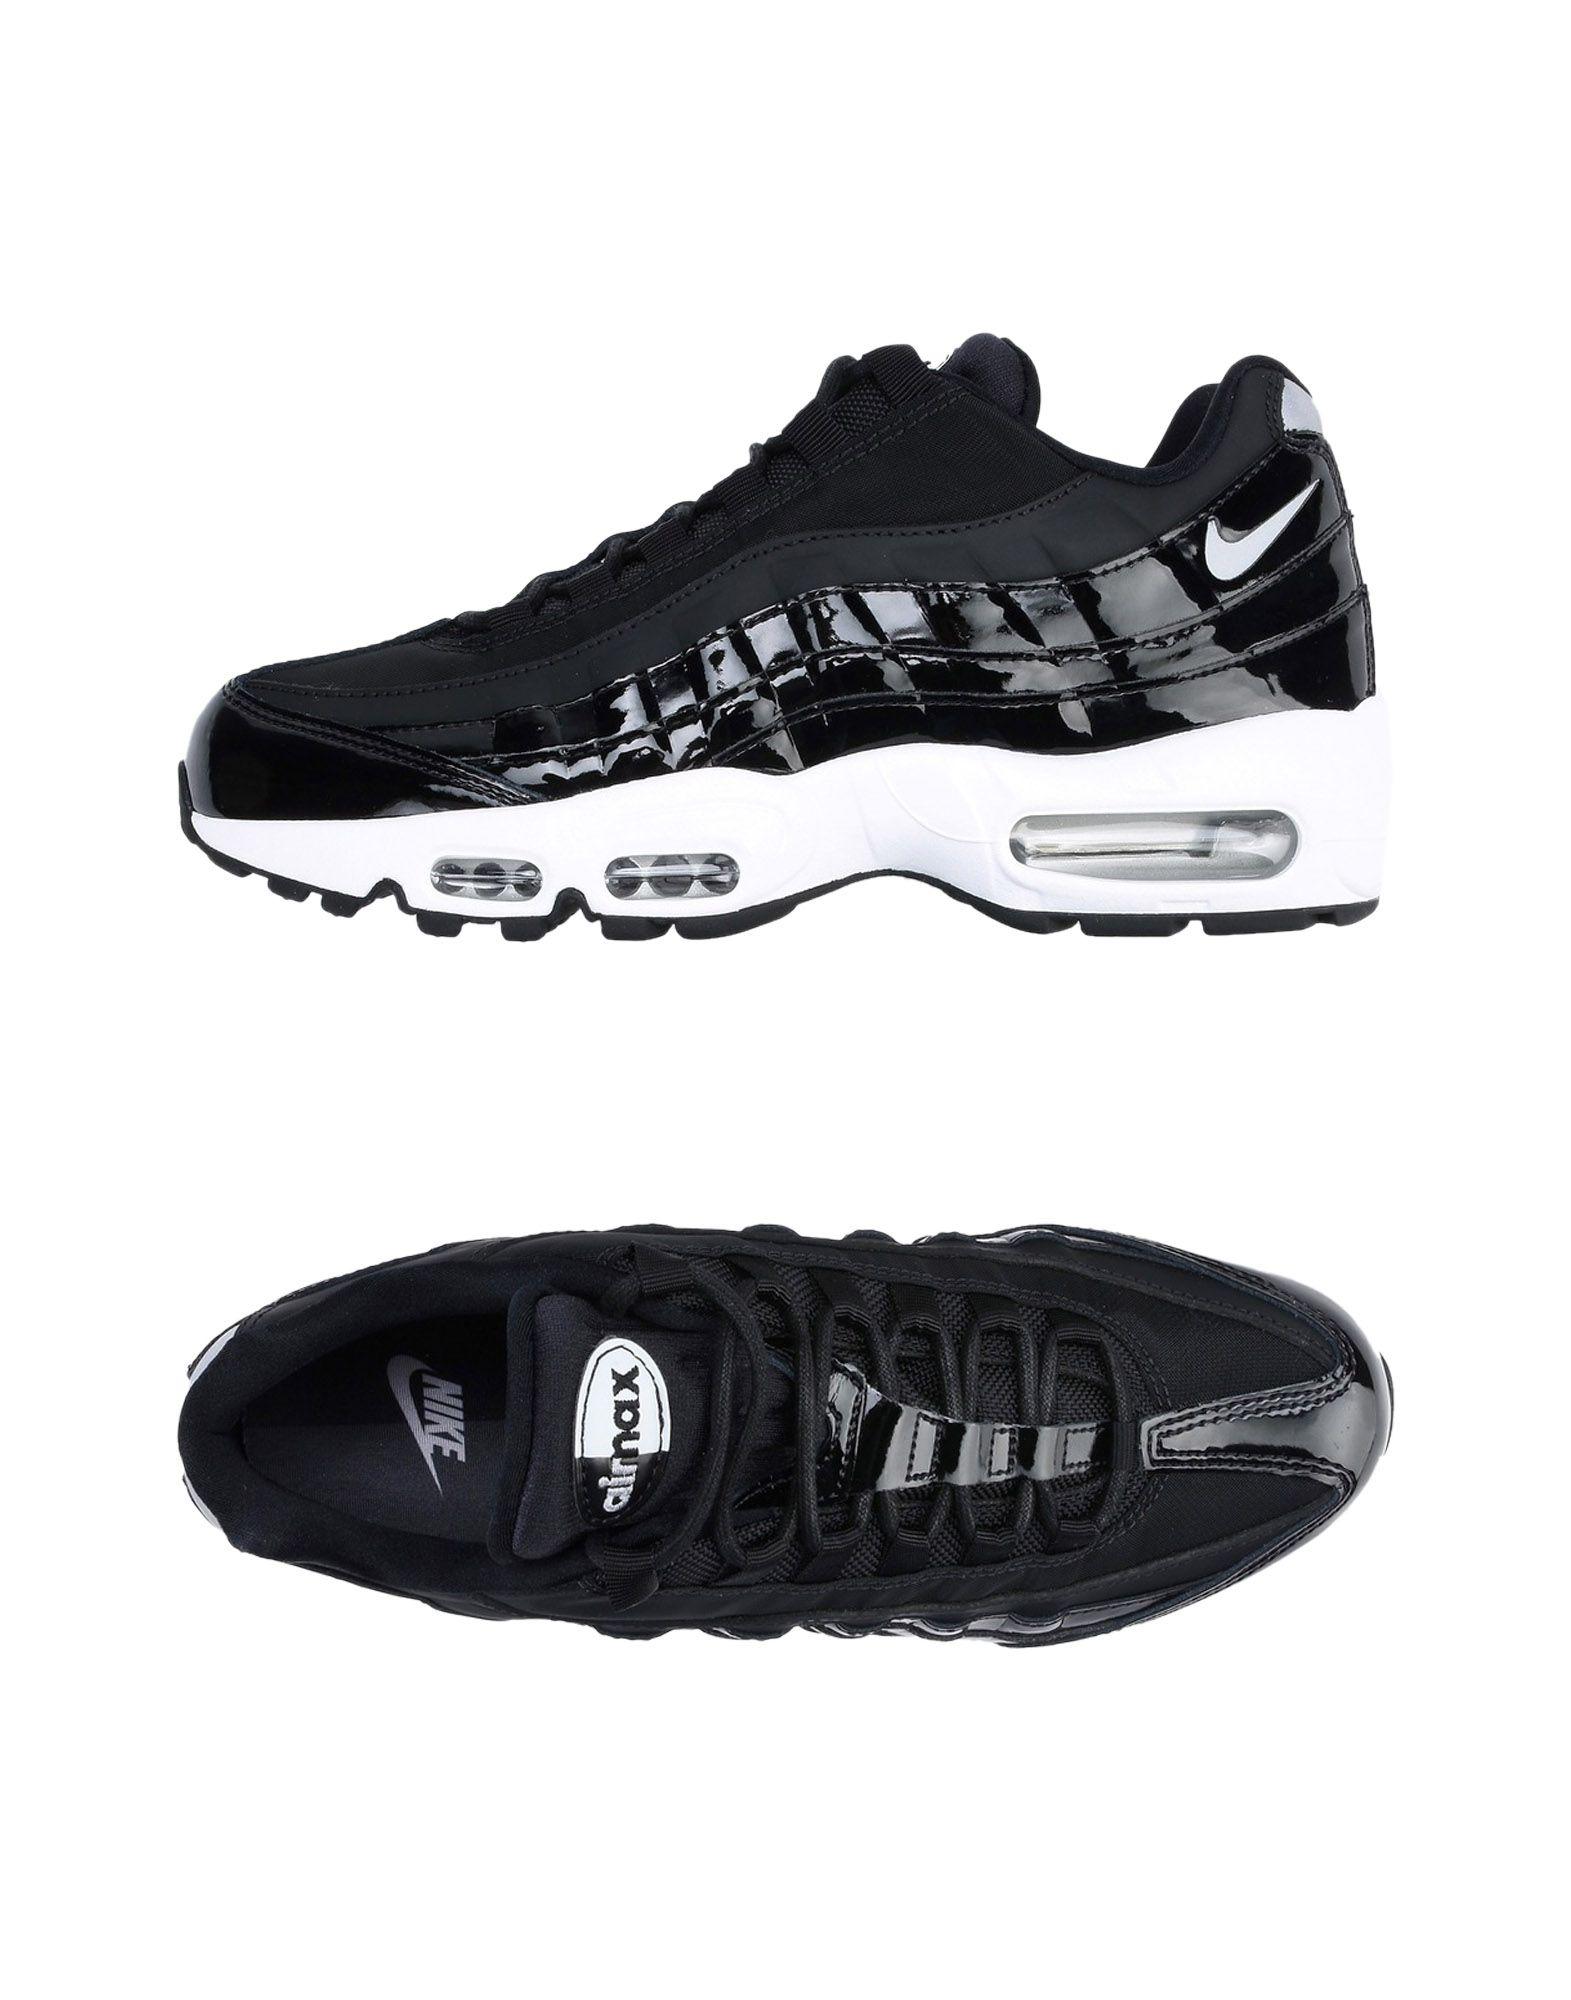 f88135307b9a3 Sneakers Nike Wmns Air Max 95 Se Prm Femme Sneakers Nike sur ...